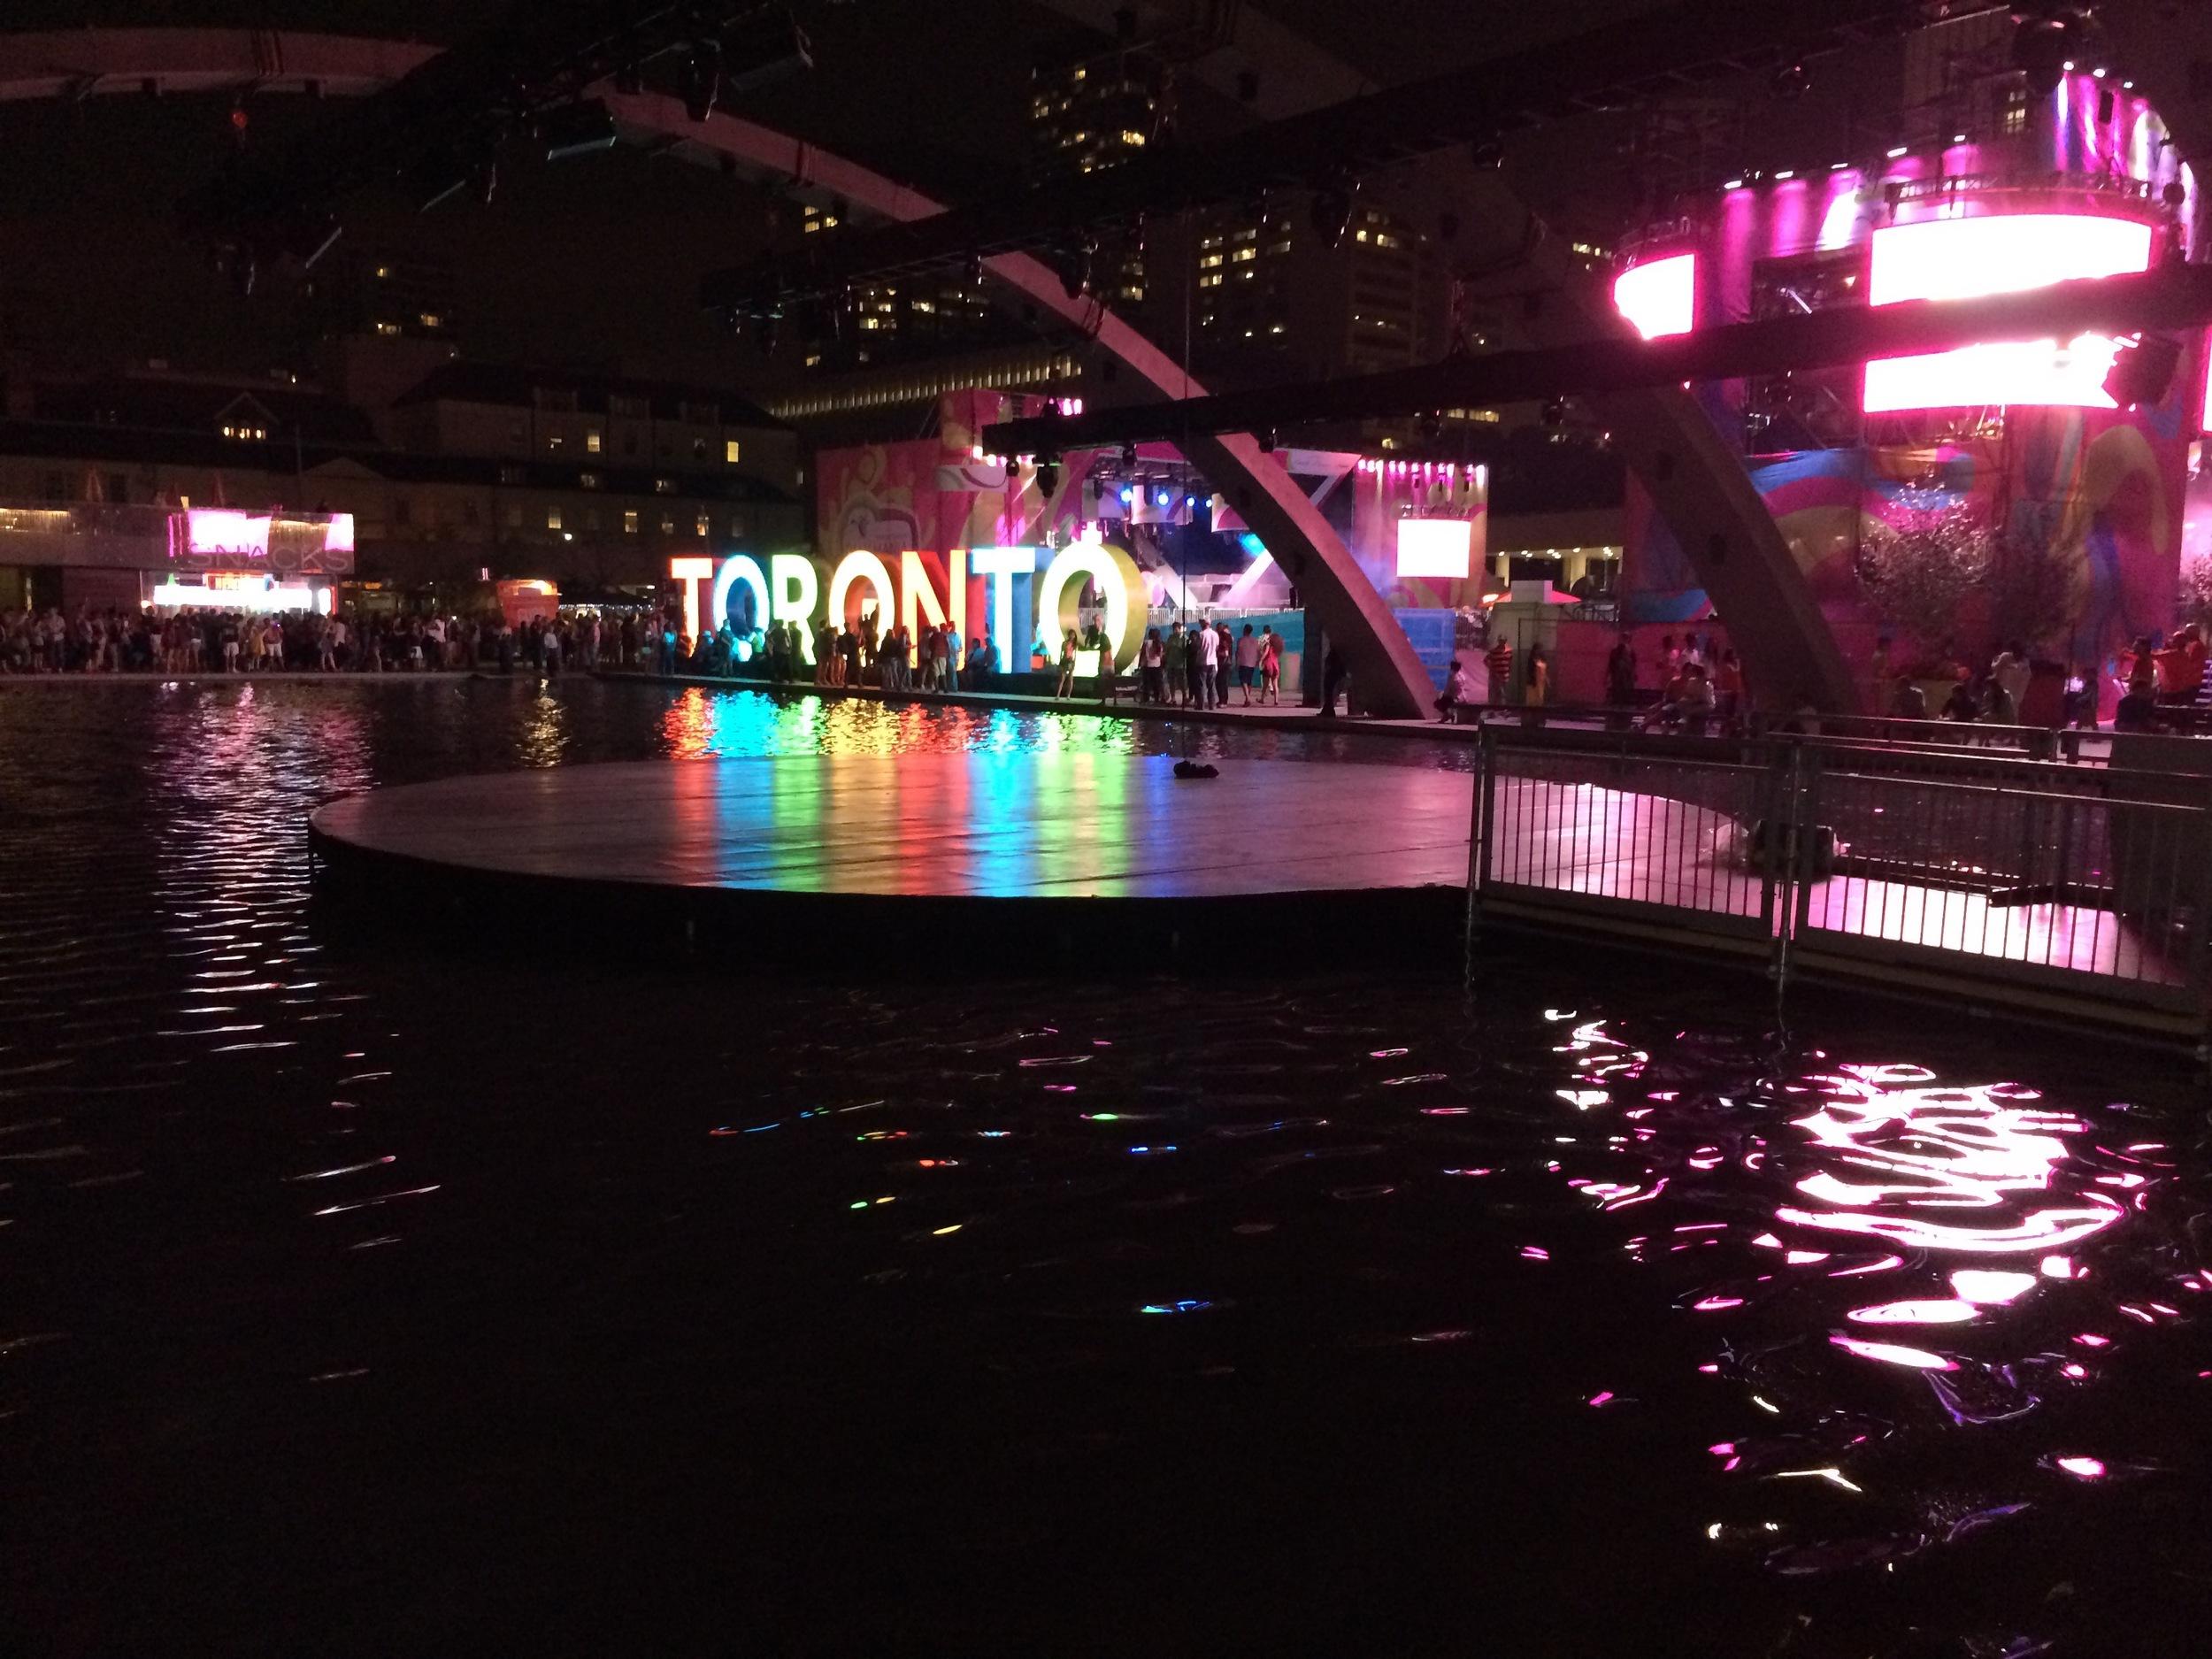 3D Toronto